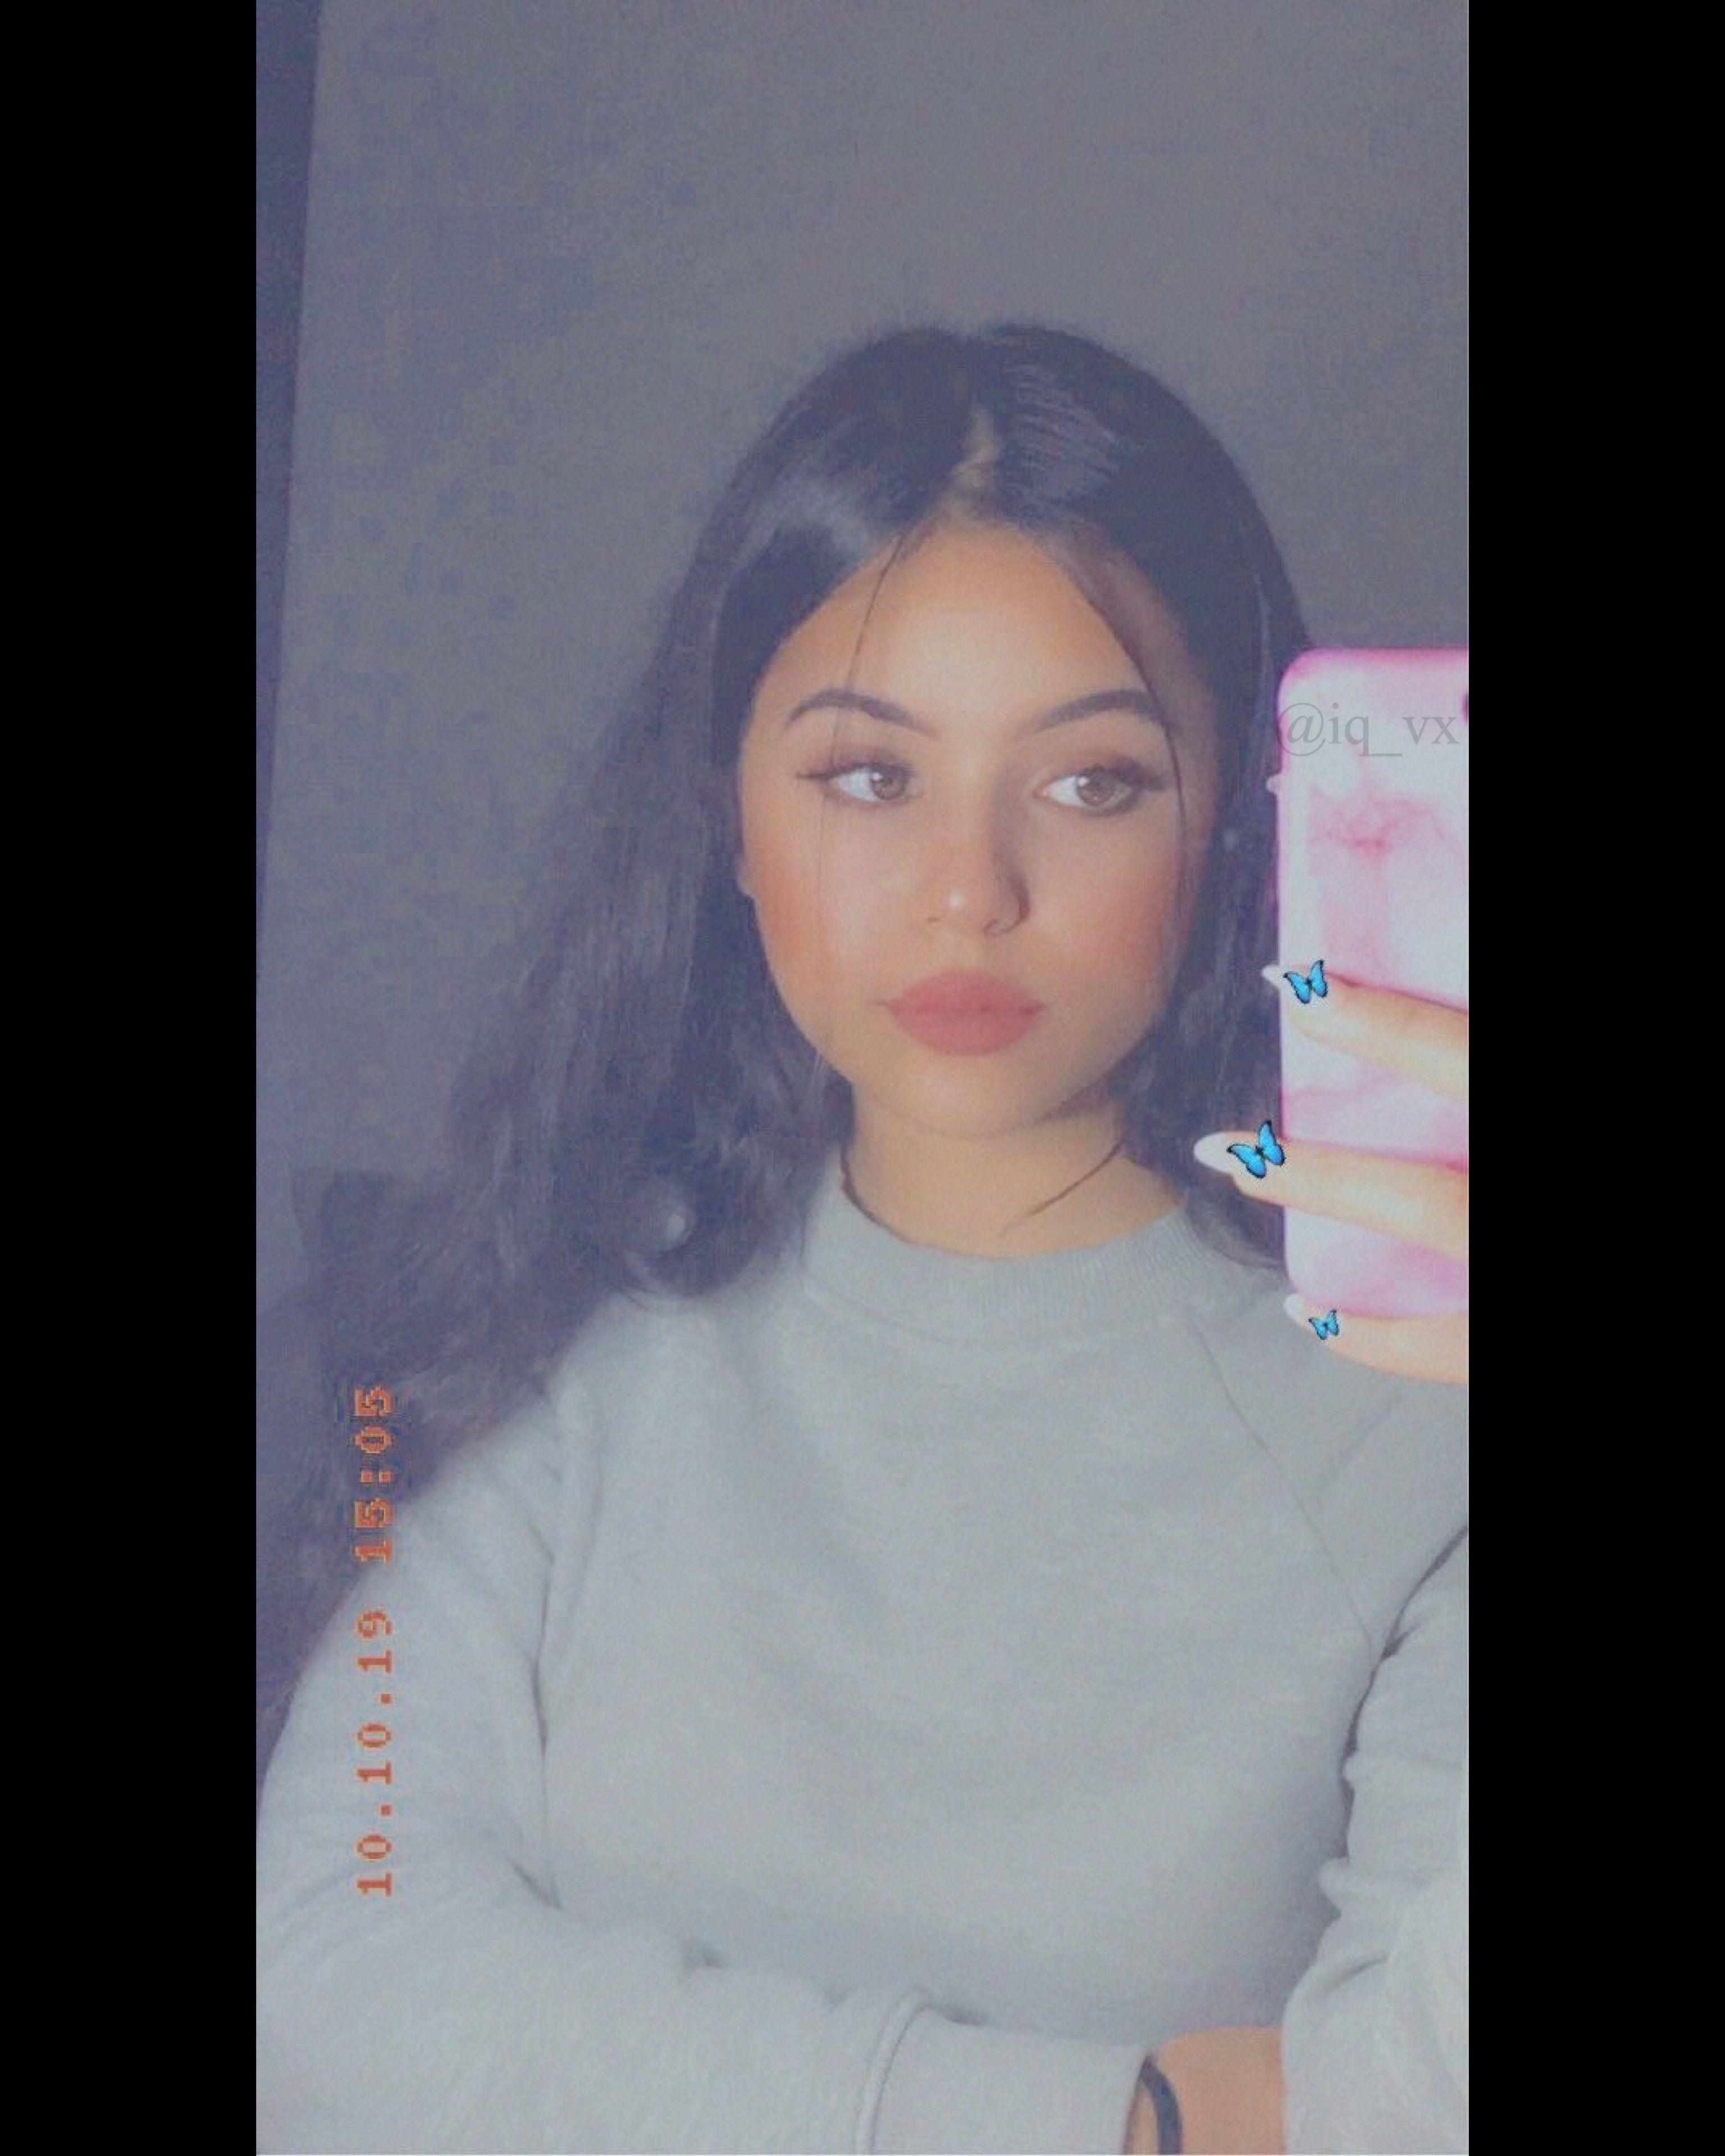 اكسبلور صور افتار افتارات رمزيات رمزيات بنات ستوريات سنابات صور بنات بنات اسئلة ستوري Beautiful Girl Makeup Pretty Girls Selfies Snapchat Girls